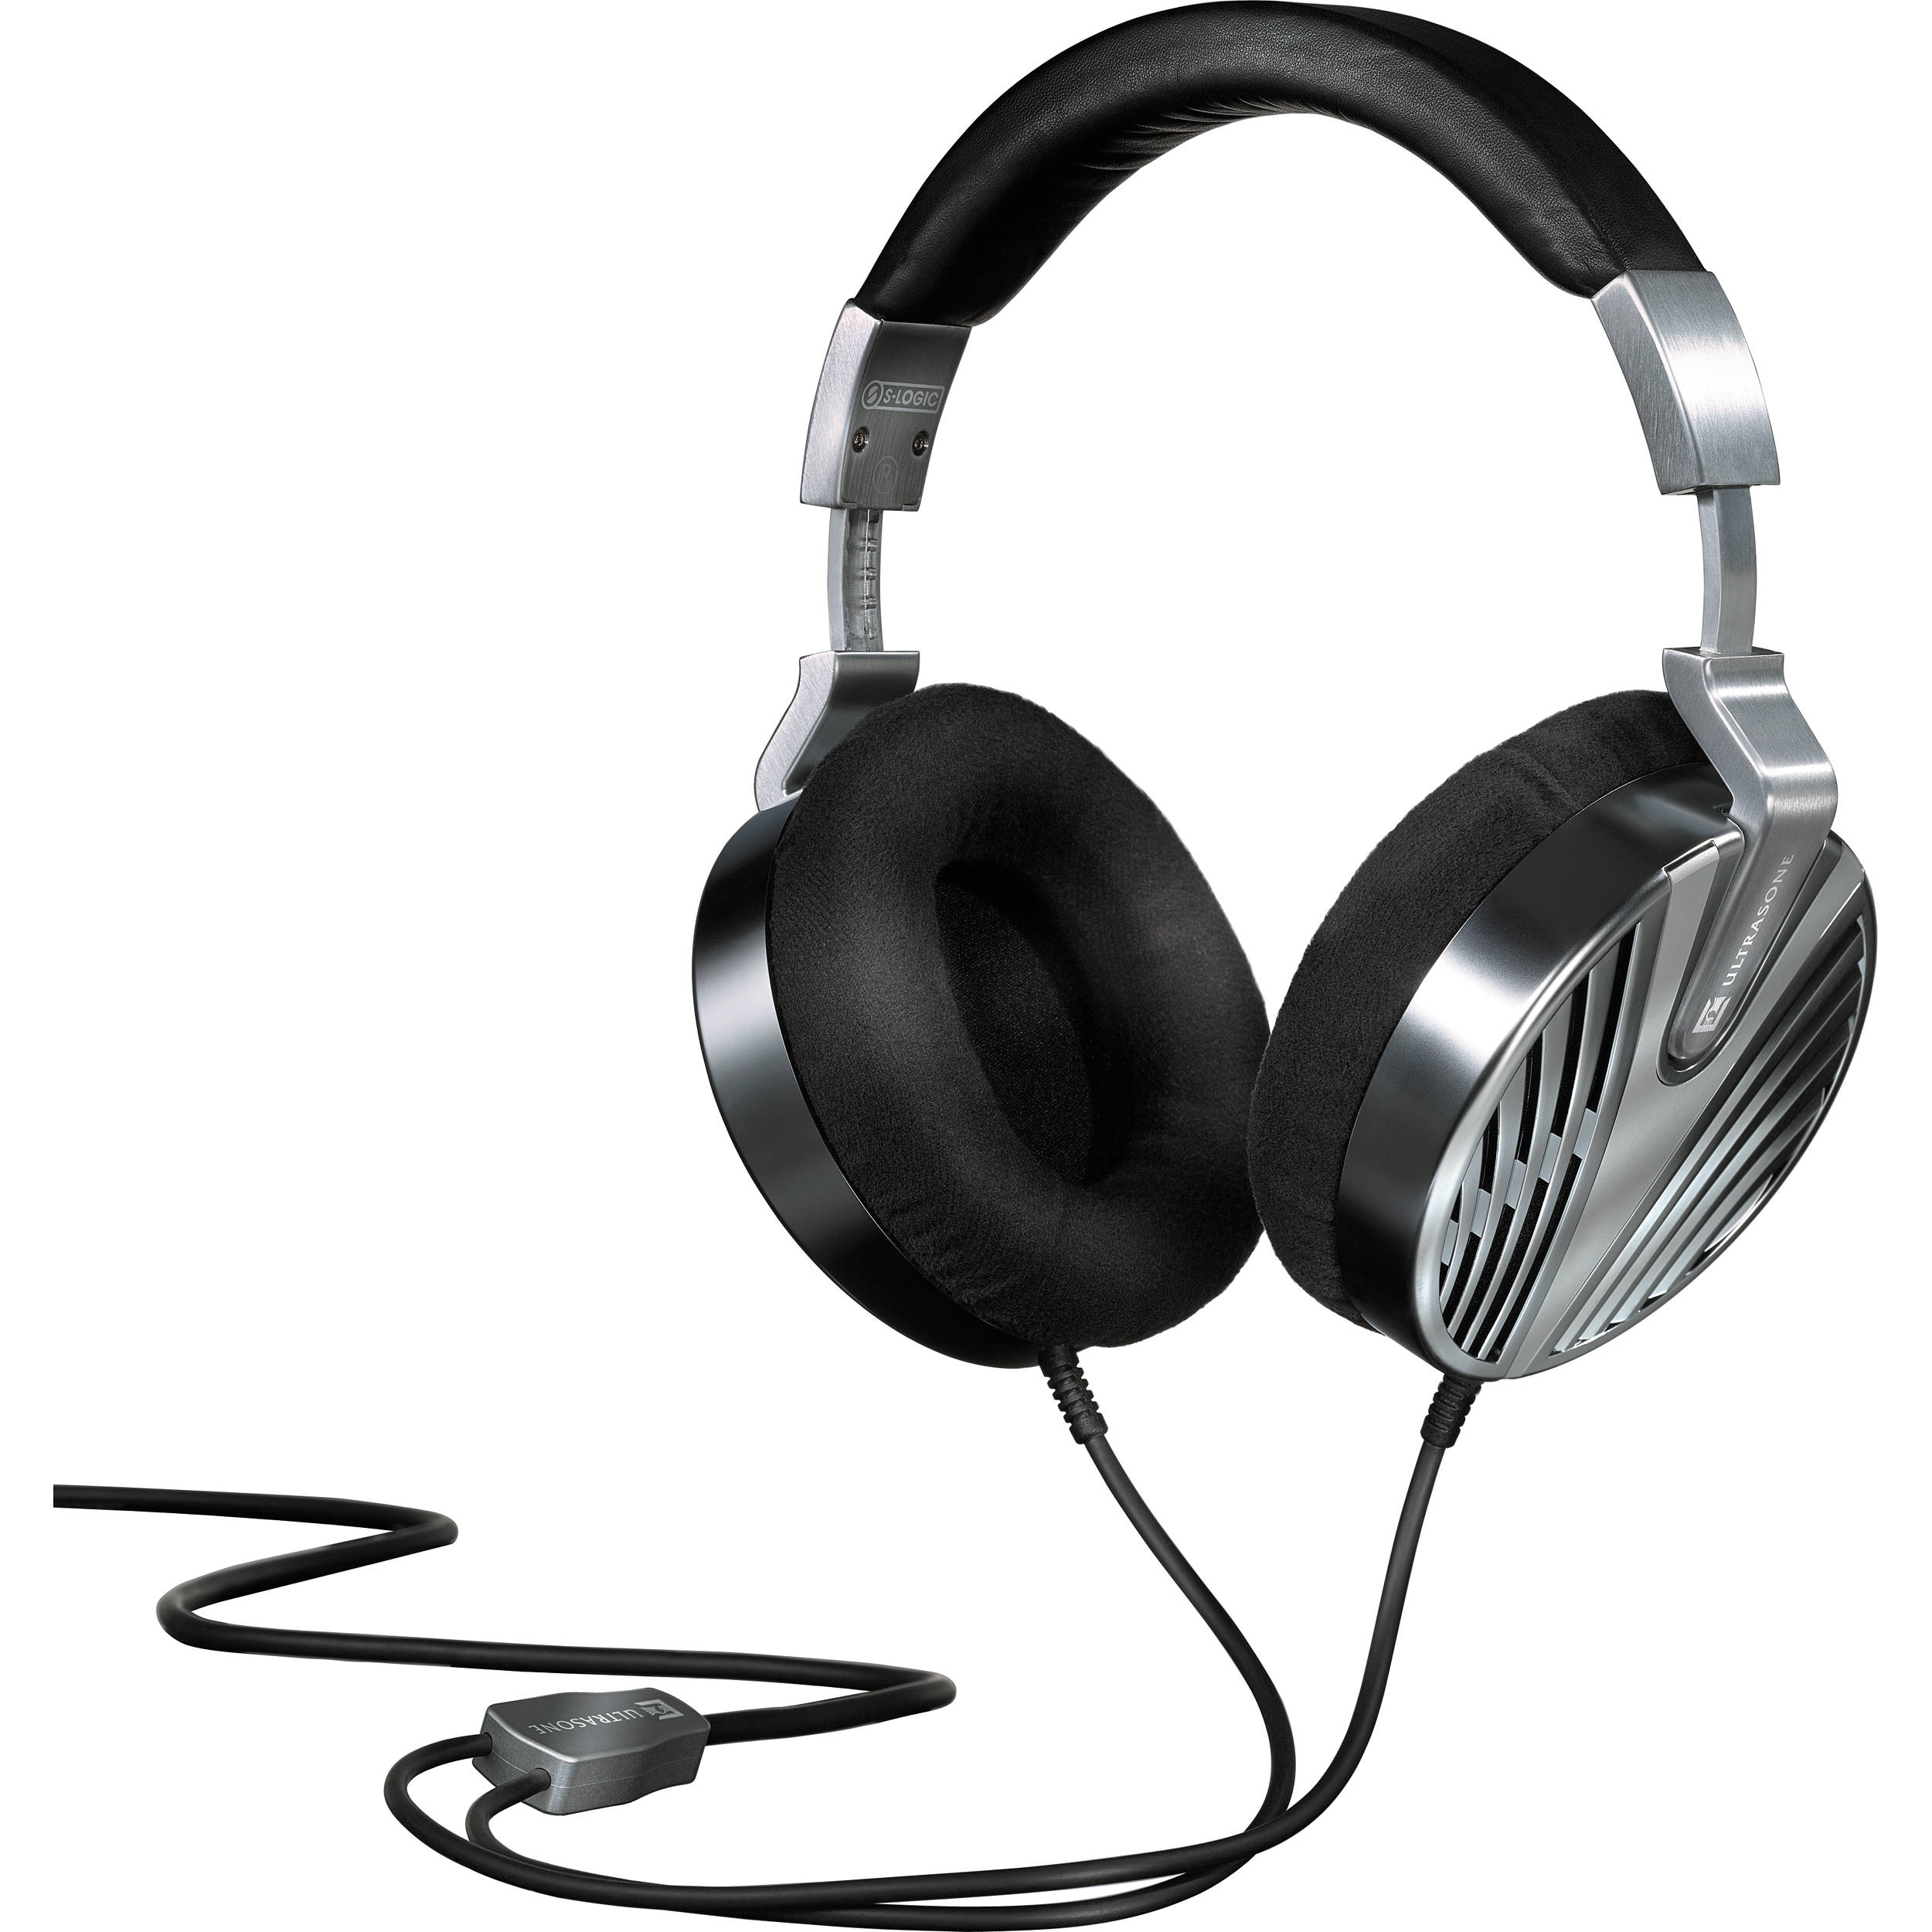 Ultrasone Edition 12 Headphones (Matte Chrome) EDITION 12 B H 964e90b38d634